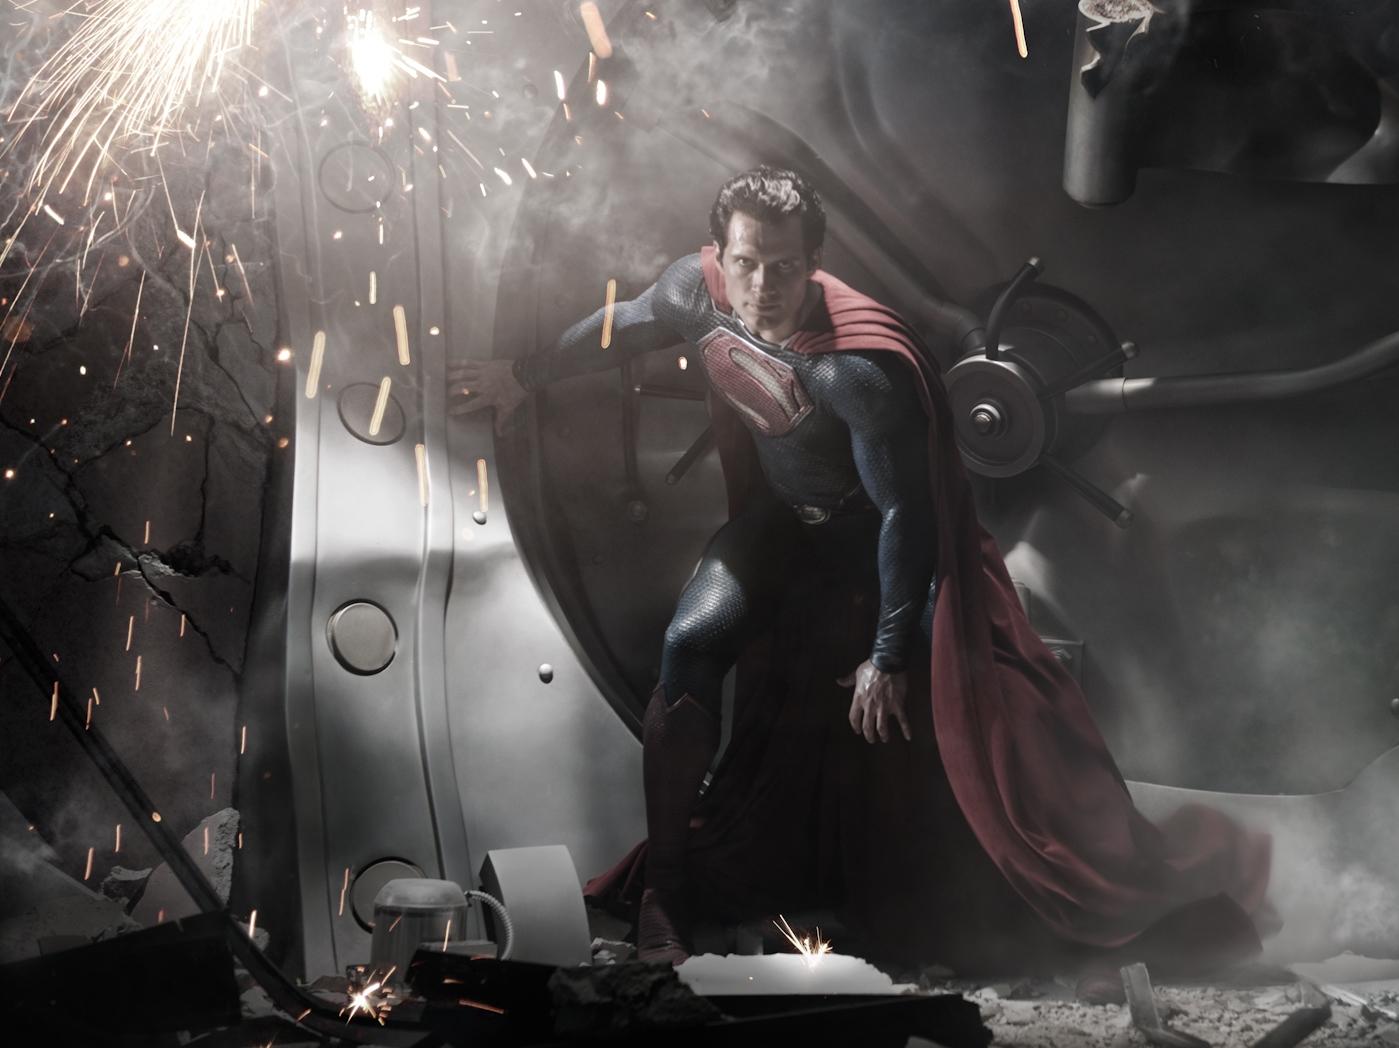 Trailer Talk: Moody 'Man of Steel' Reboots Superman, Image